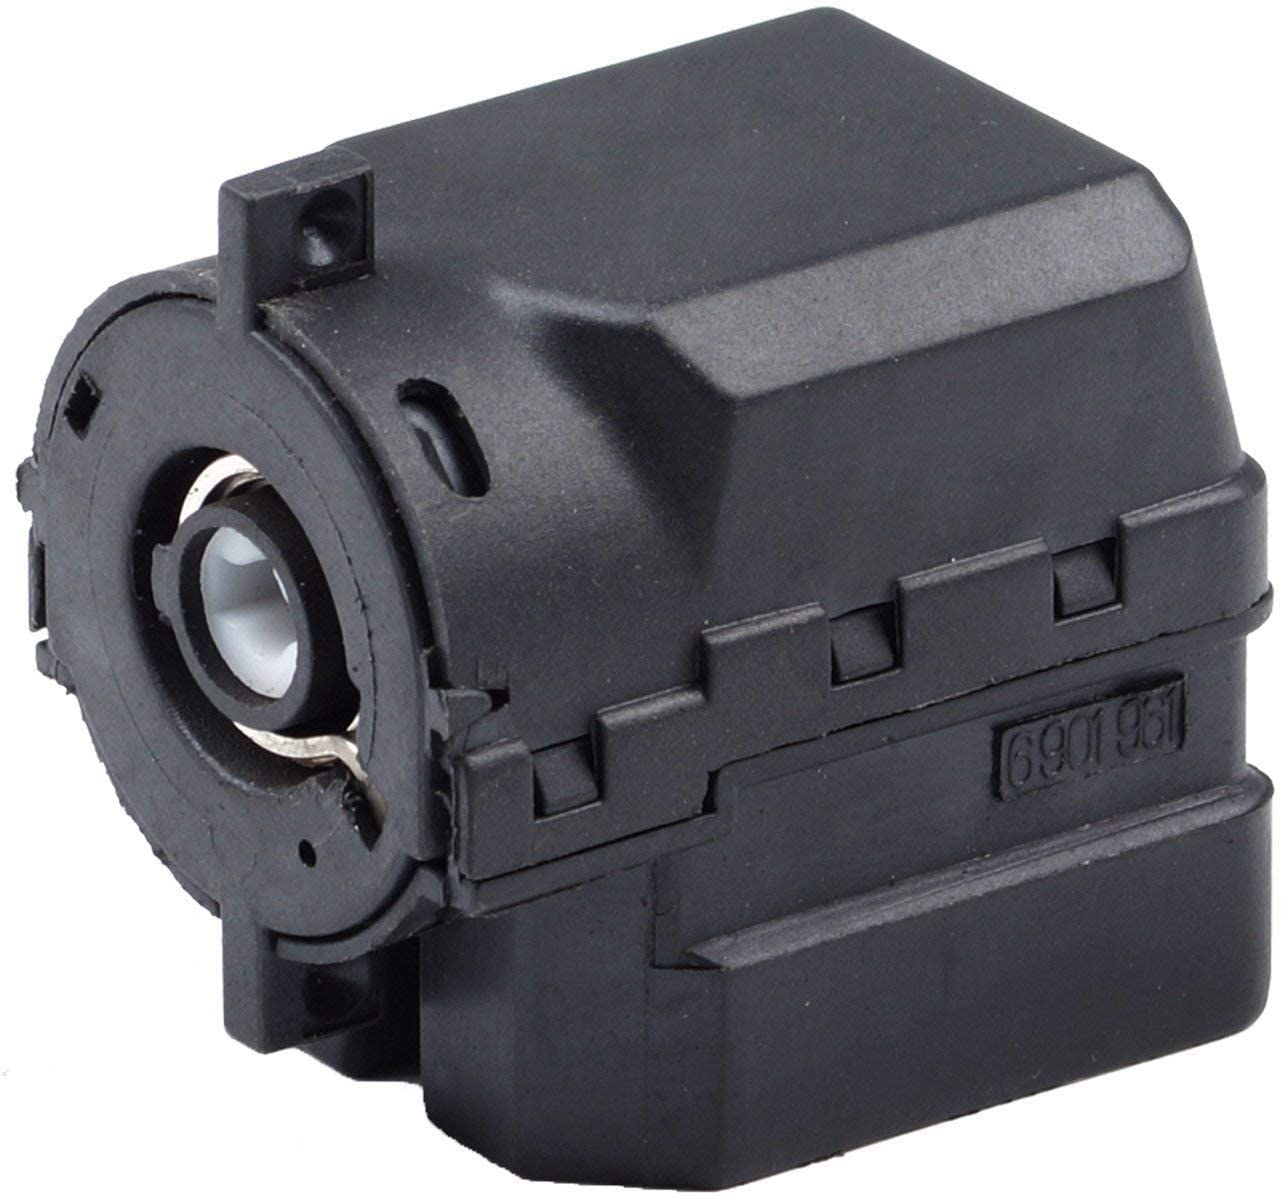 Vehicle Ignition Switch for BMW E46 318i 325i 330Ci E39 E38 X5 E53 Z4 E85 6132-6901-961